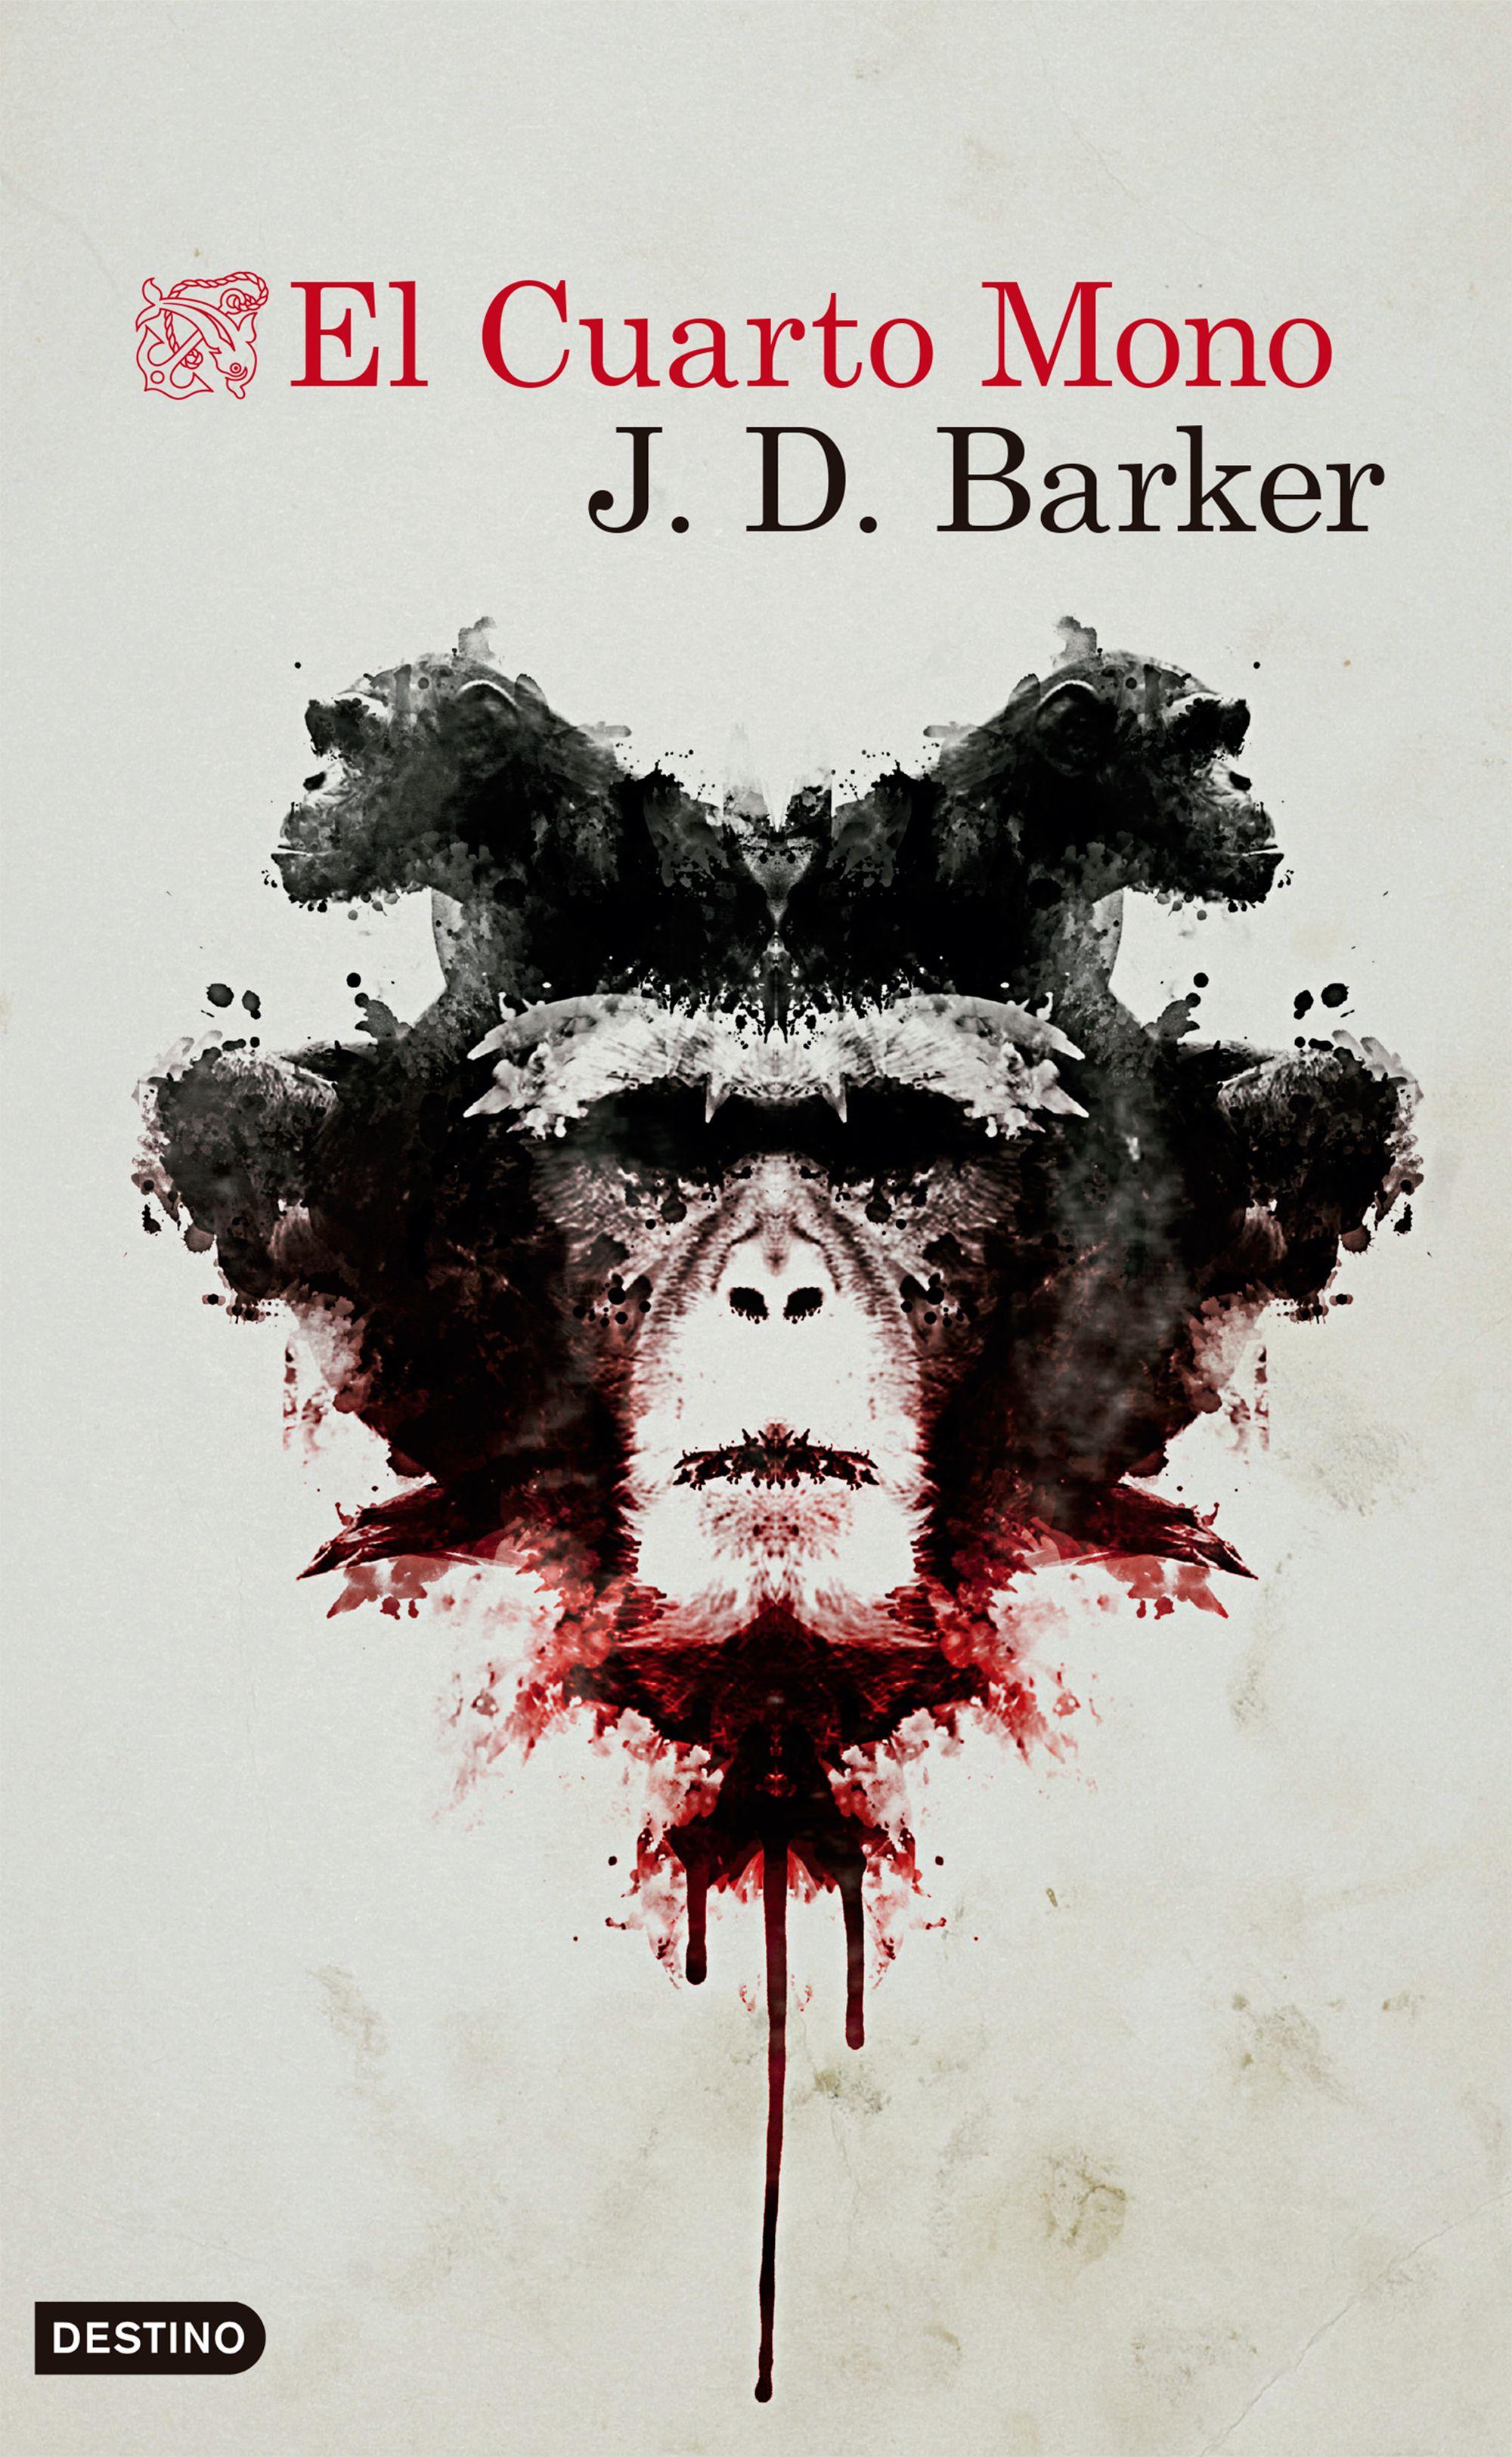 El Cuarto Mono - J.D. Barker - Destino